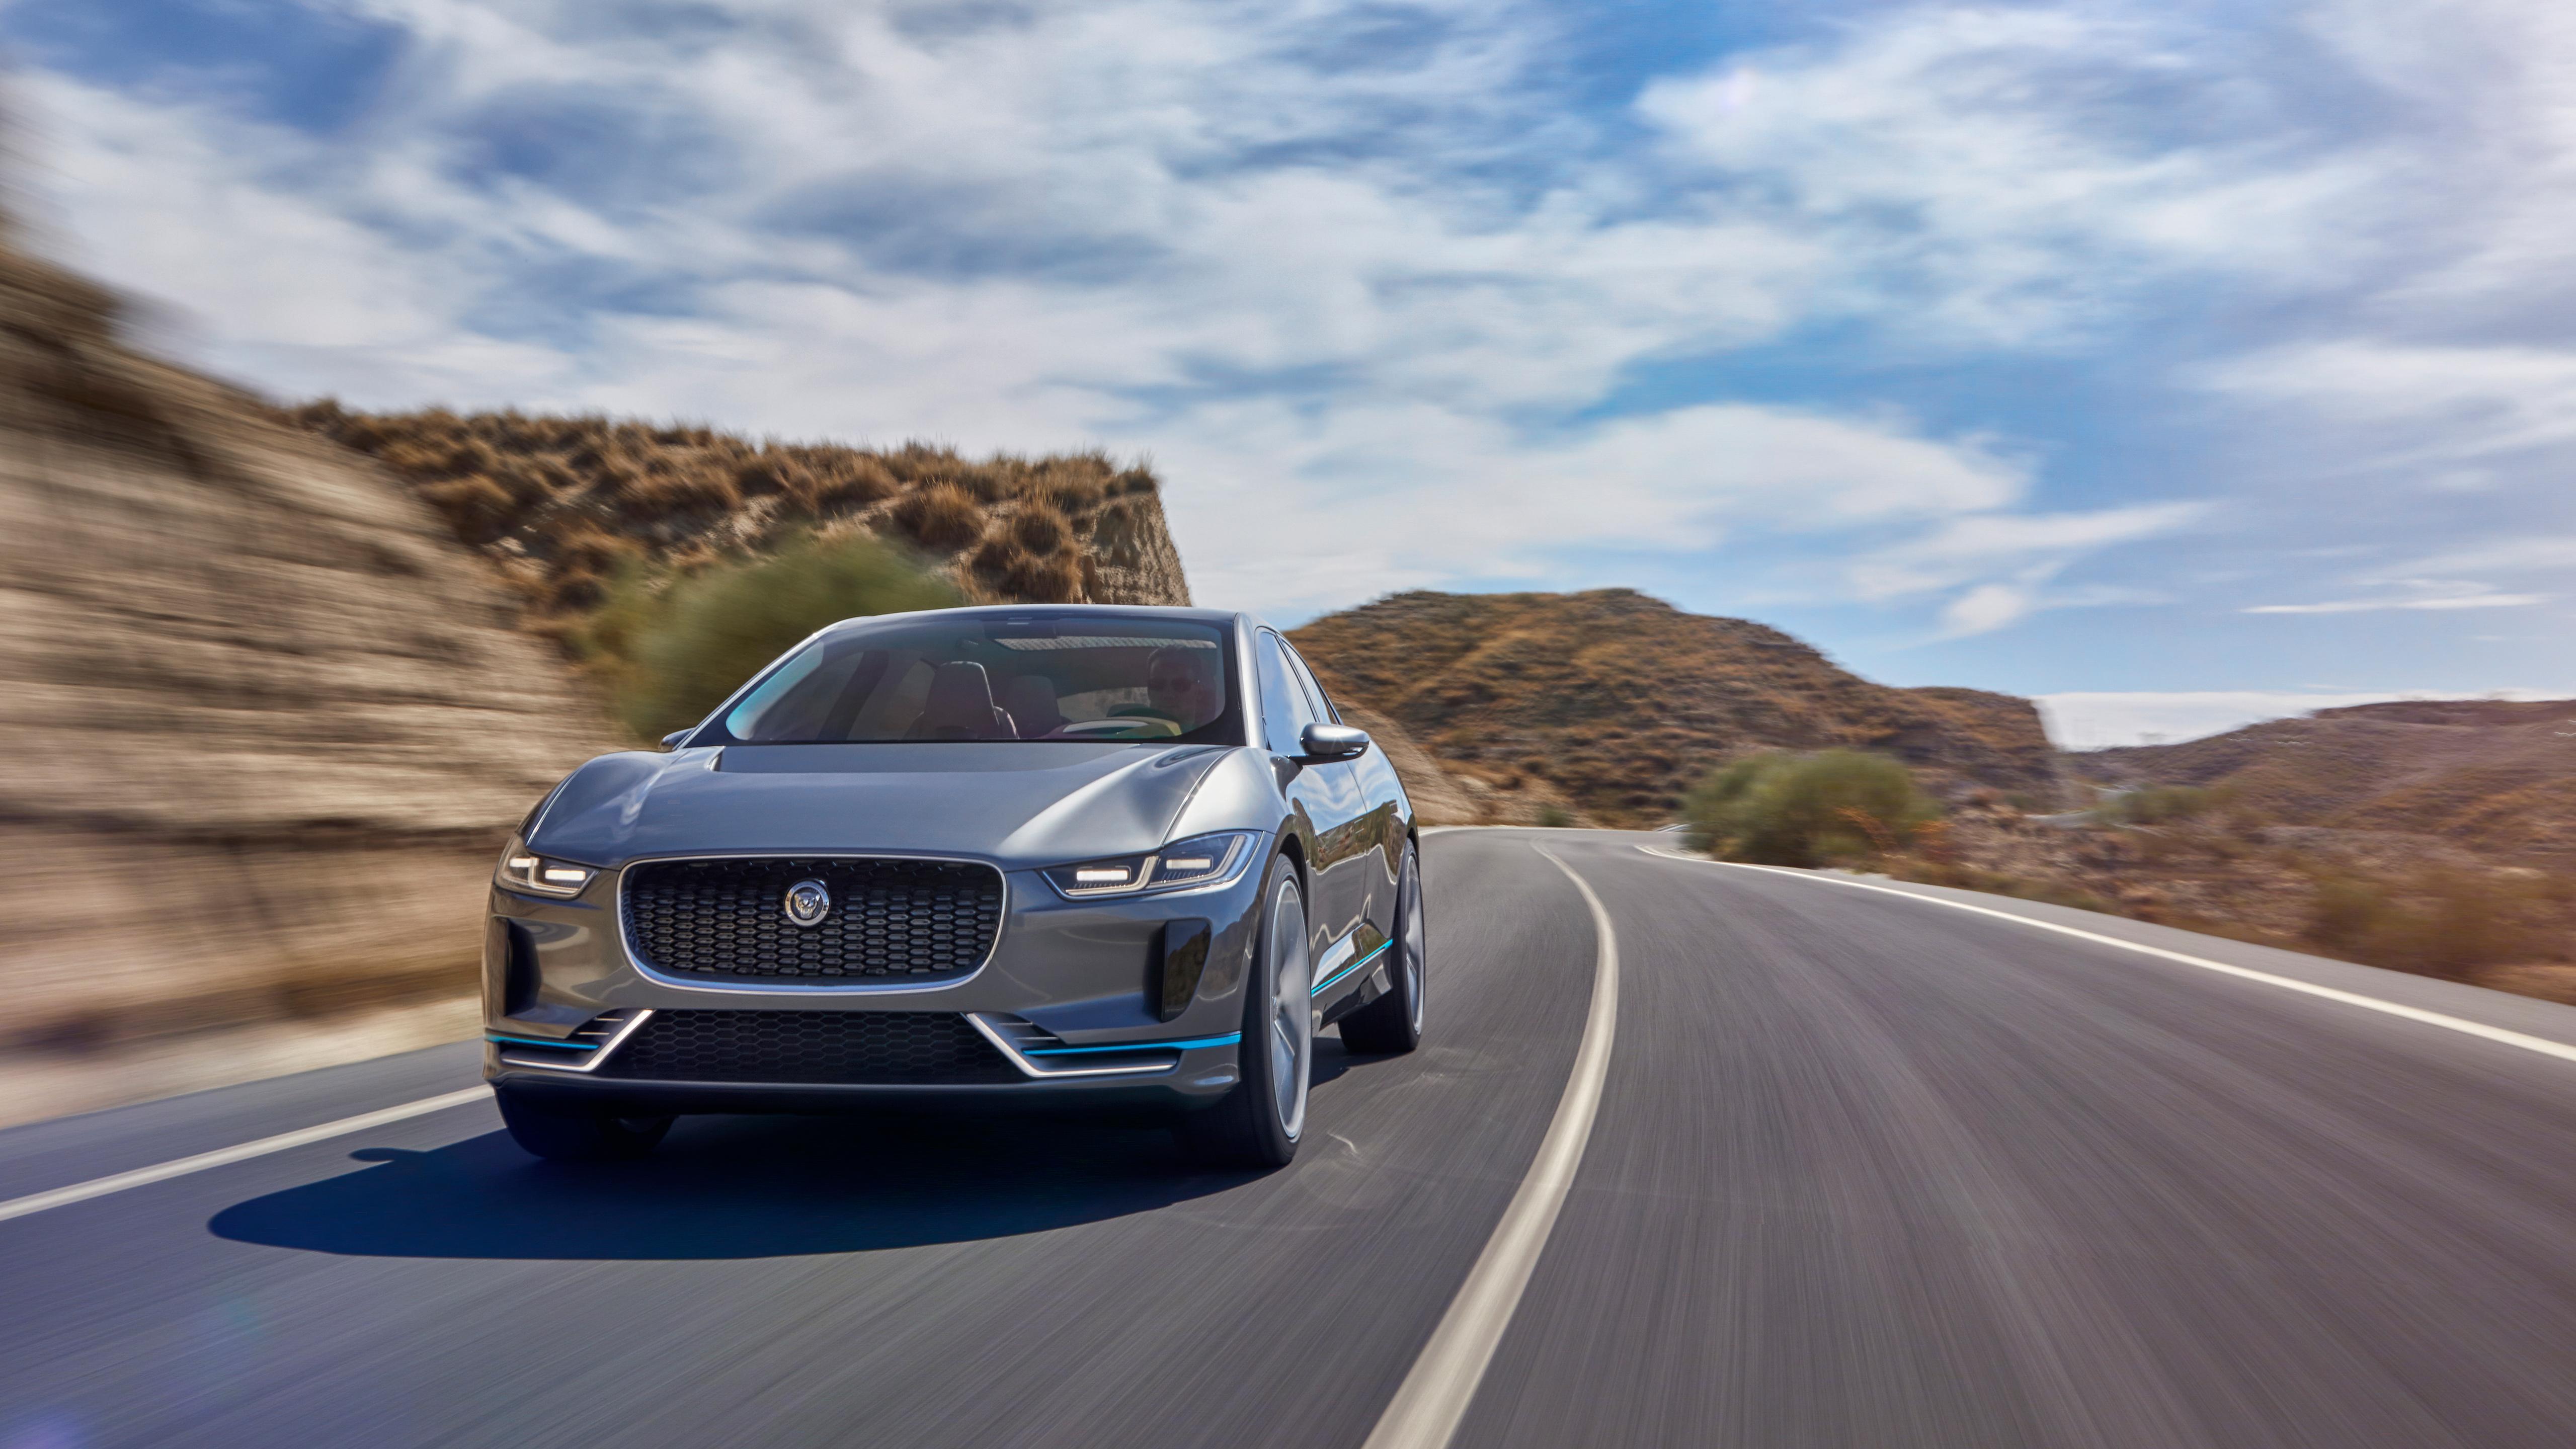 2018 Jaguar I Pace Electric Suv 5k Wallpaper Hd Car Wallpapers